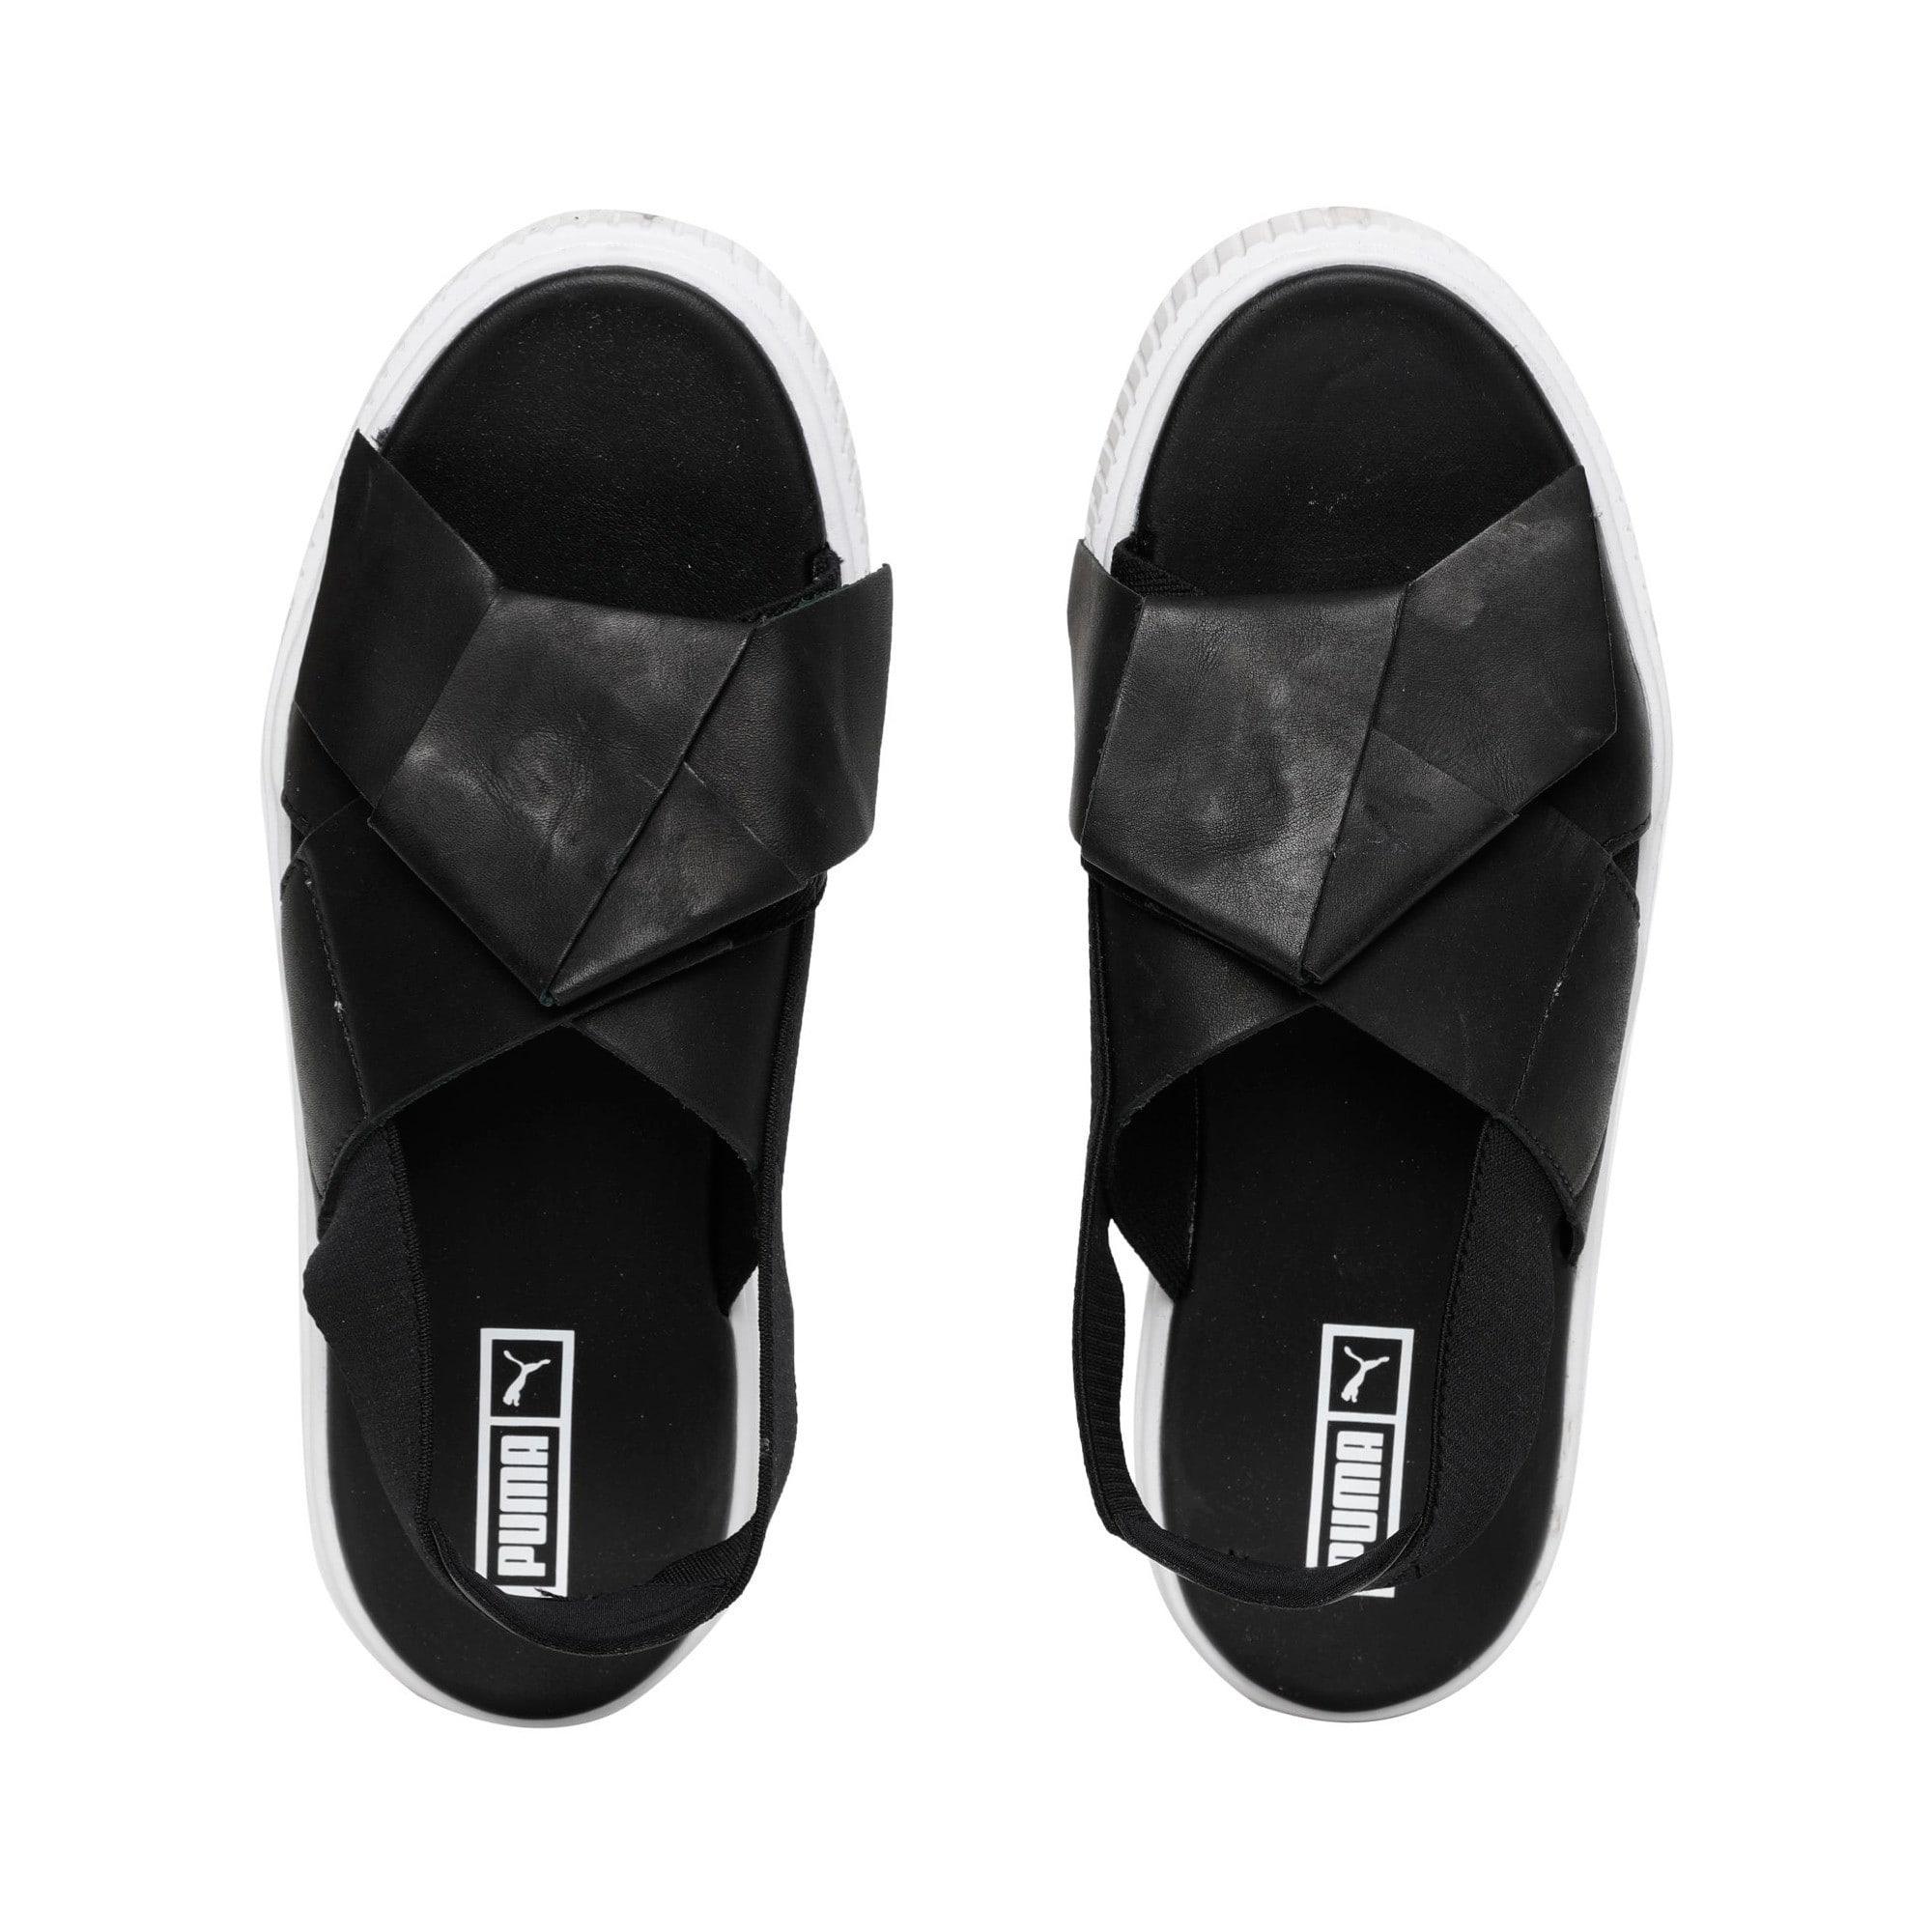 Thumbnail 7 of Platform Leather Women's Sandals, Puma Black-Puma Black, medium-IND